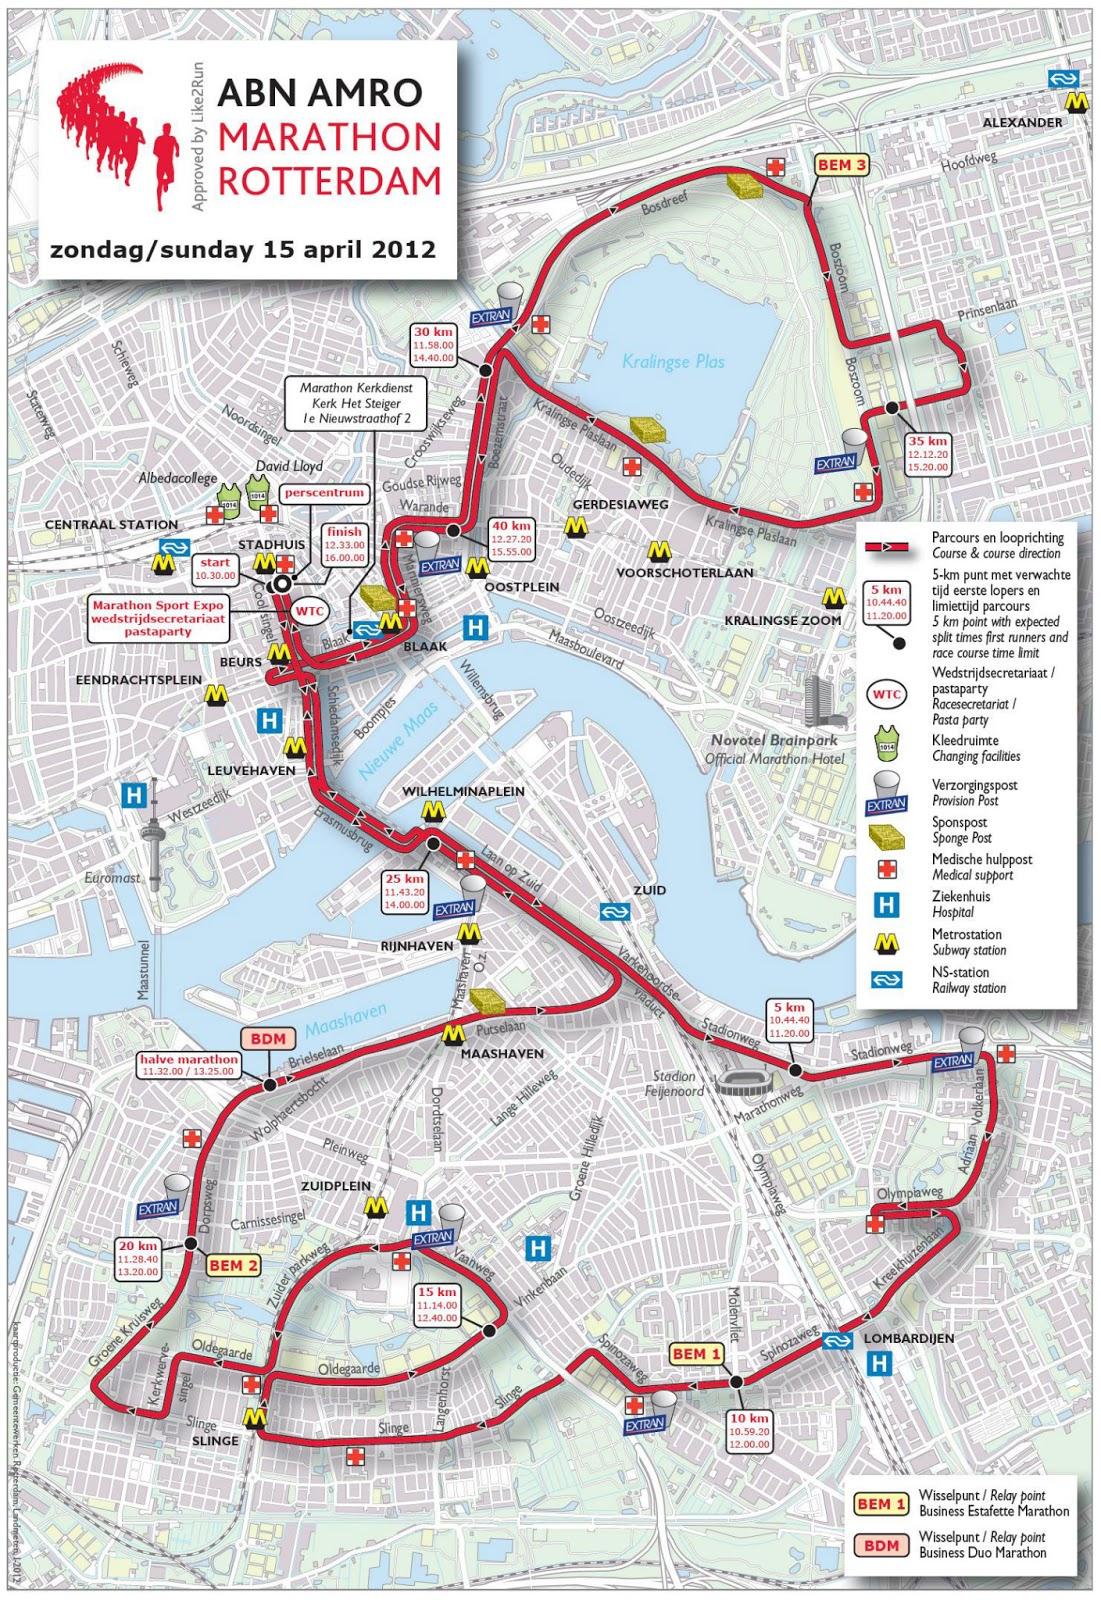 FunRun Top  Worlds Marathon Course Records As Of End - Chicago marathon map 2016